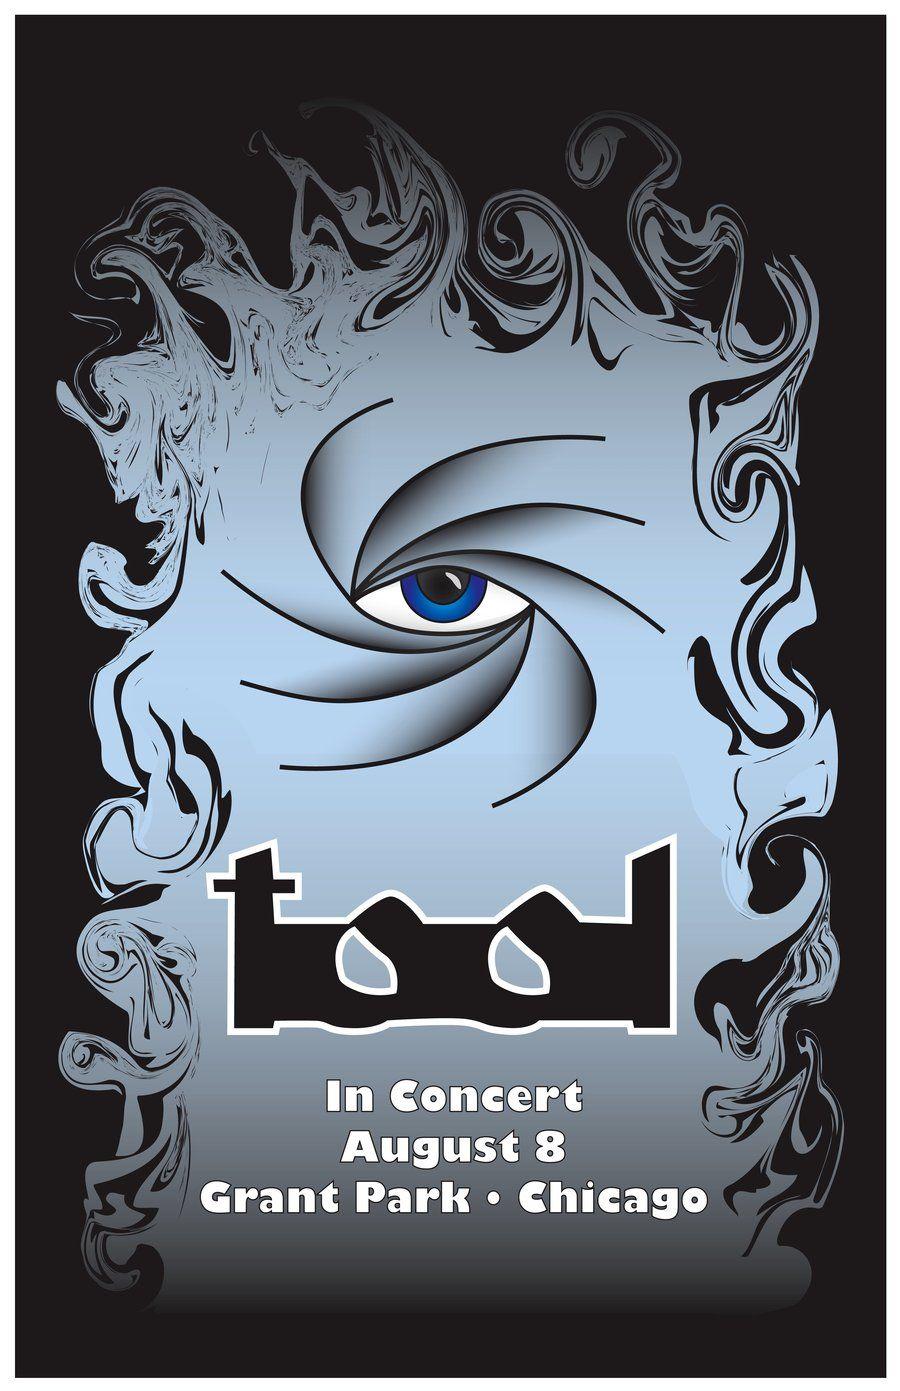 concert poster art tool band artwork